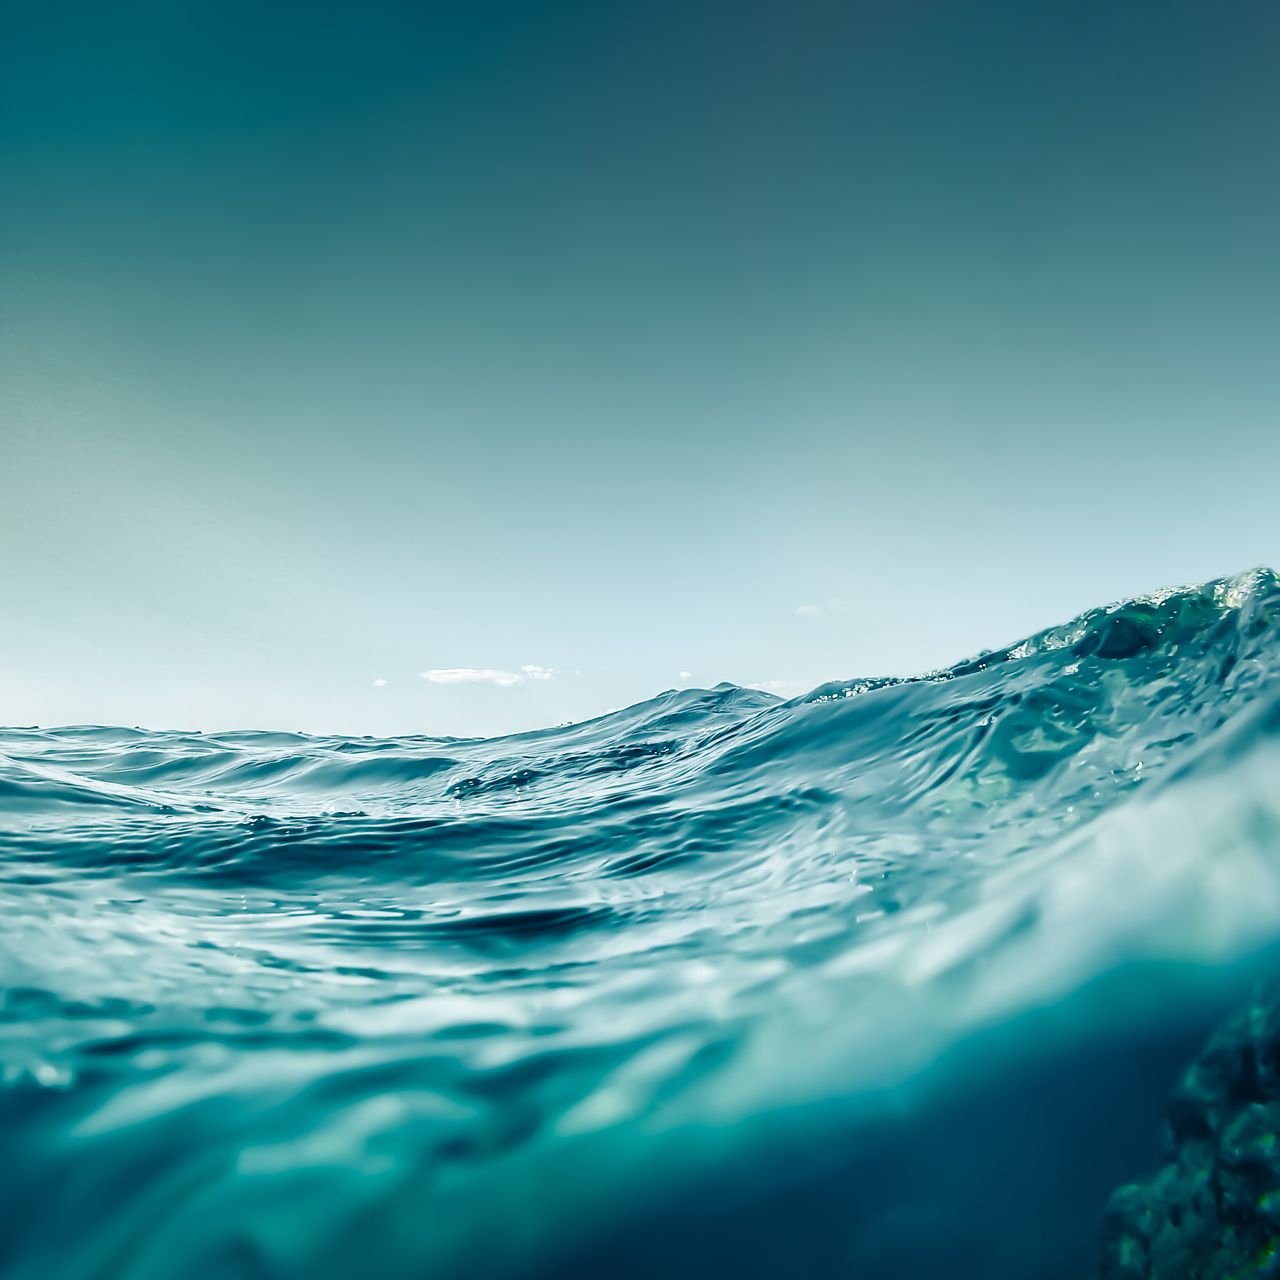 Pin by Abdulla Munfiz on Nature Pinterest Ocean